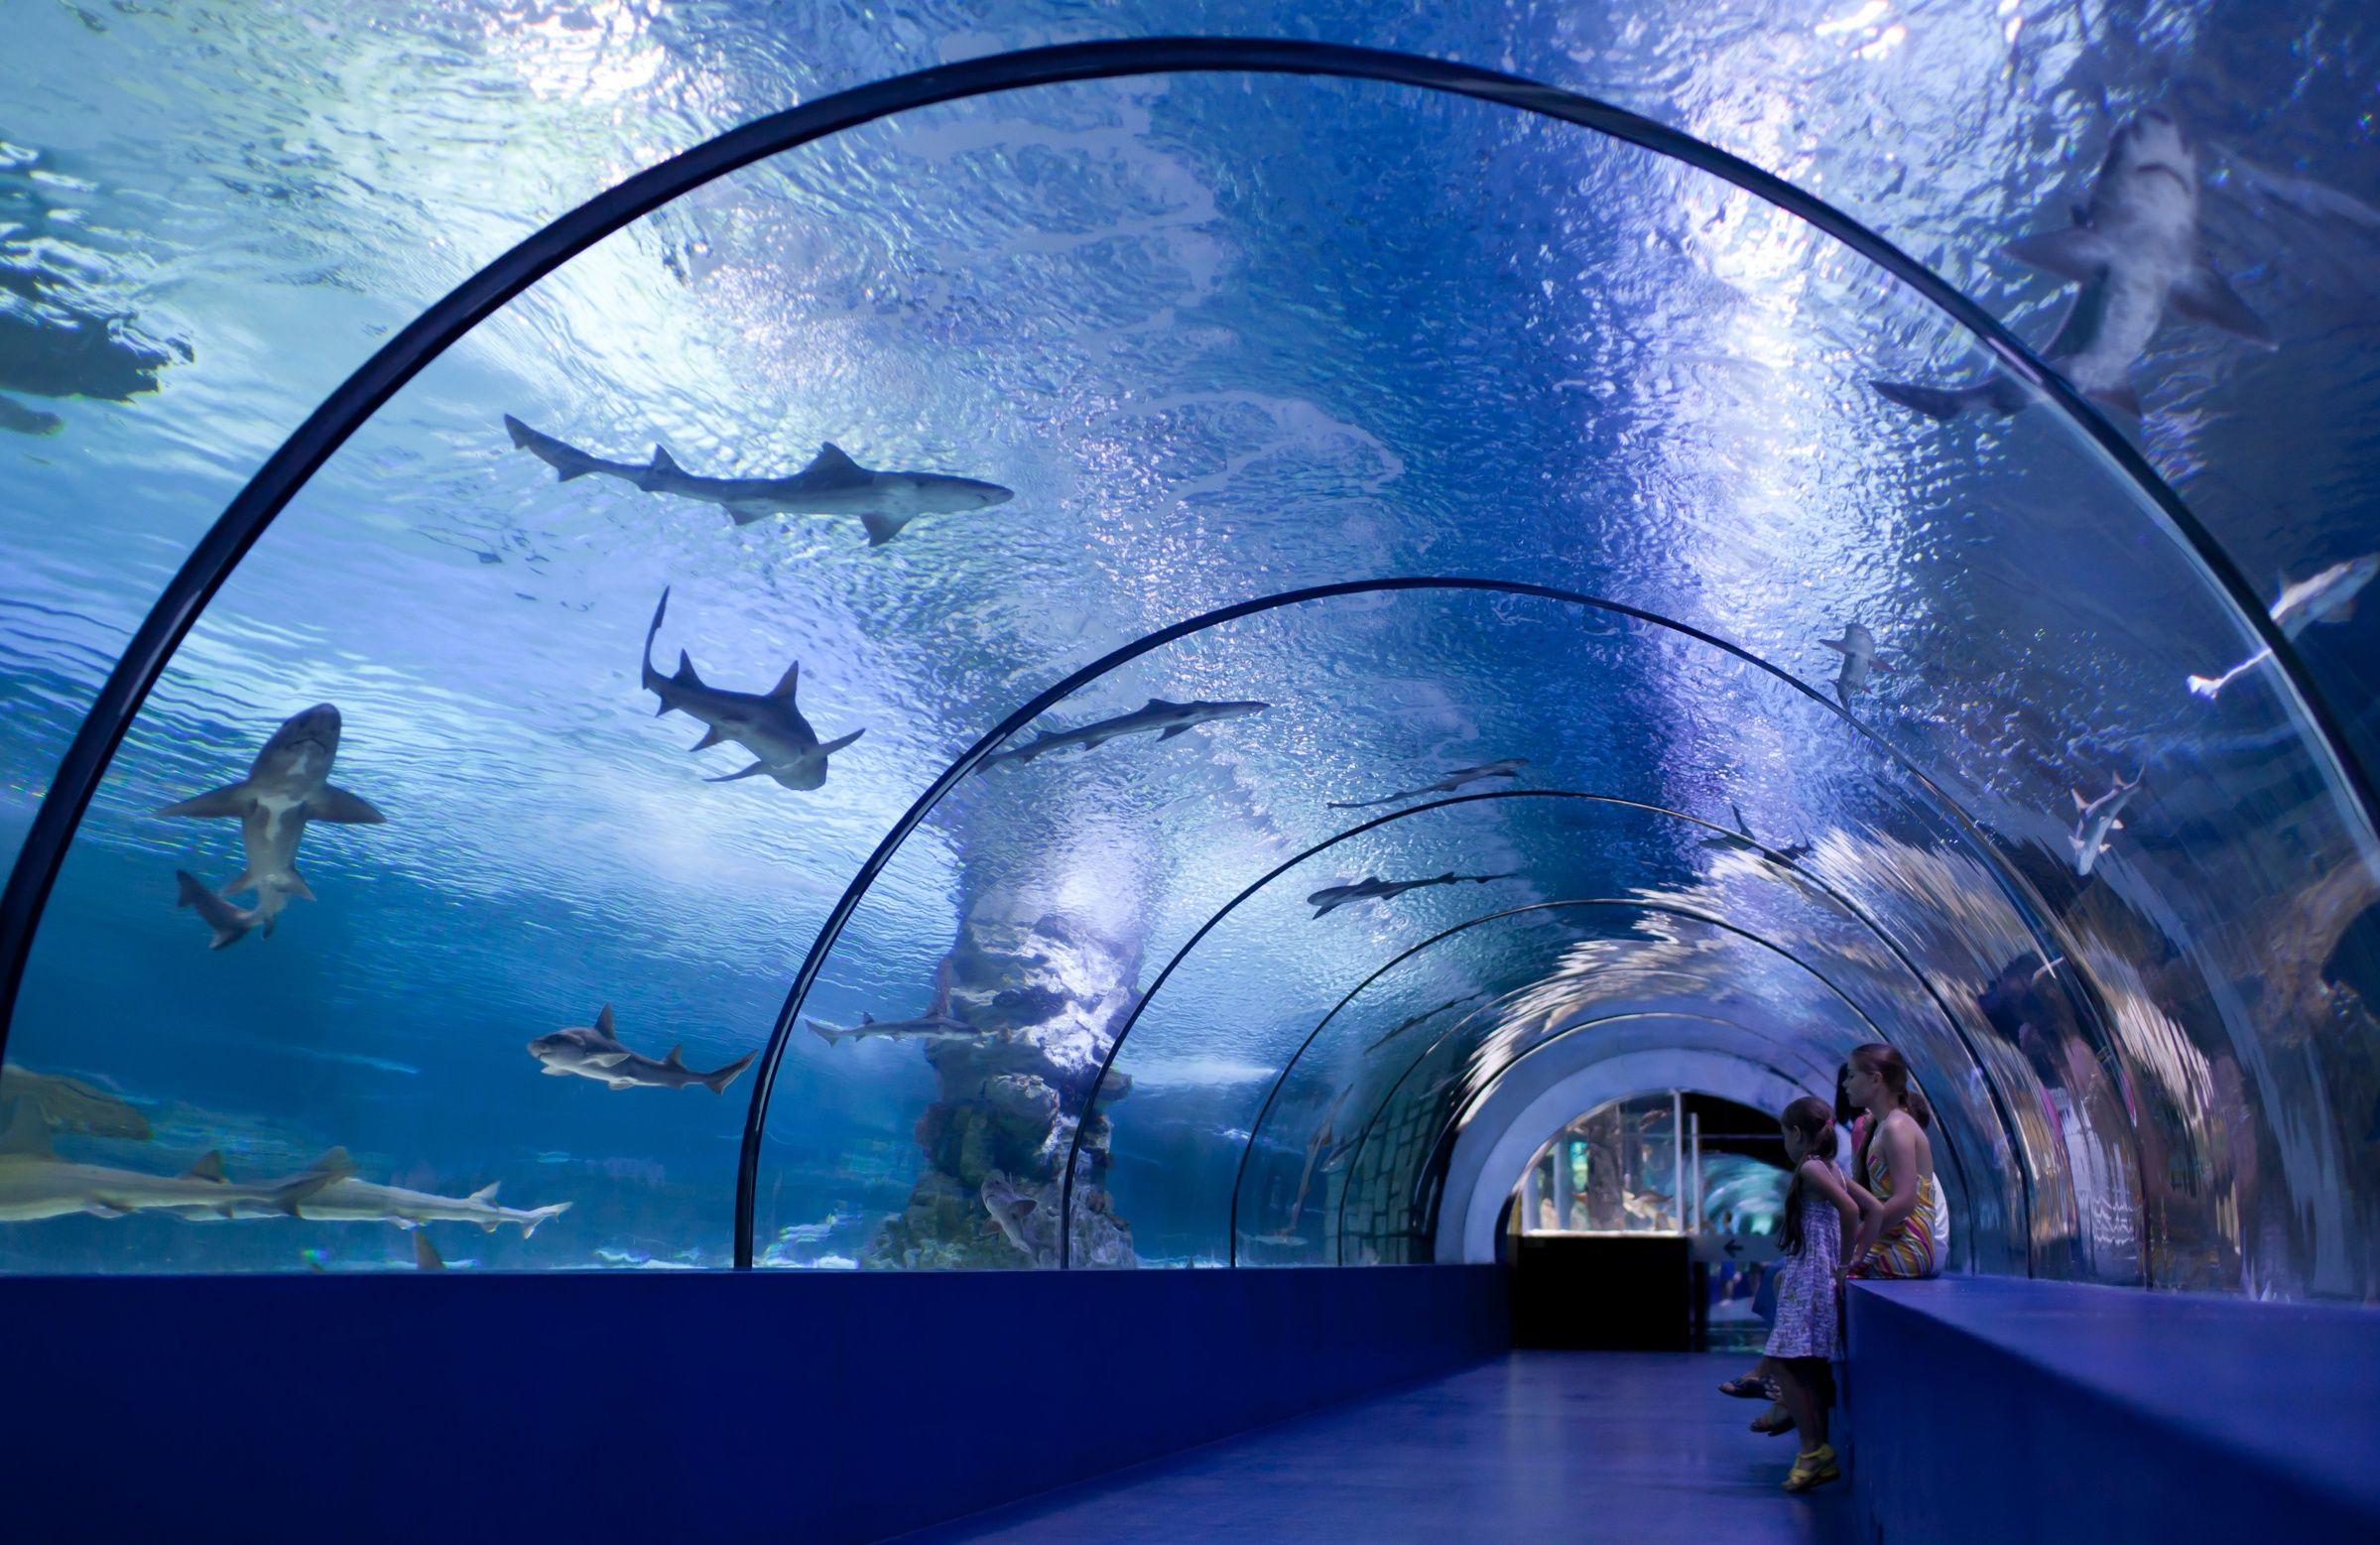 The Osaka Aquarium Kaiyukan is an aquarium located in the ...